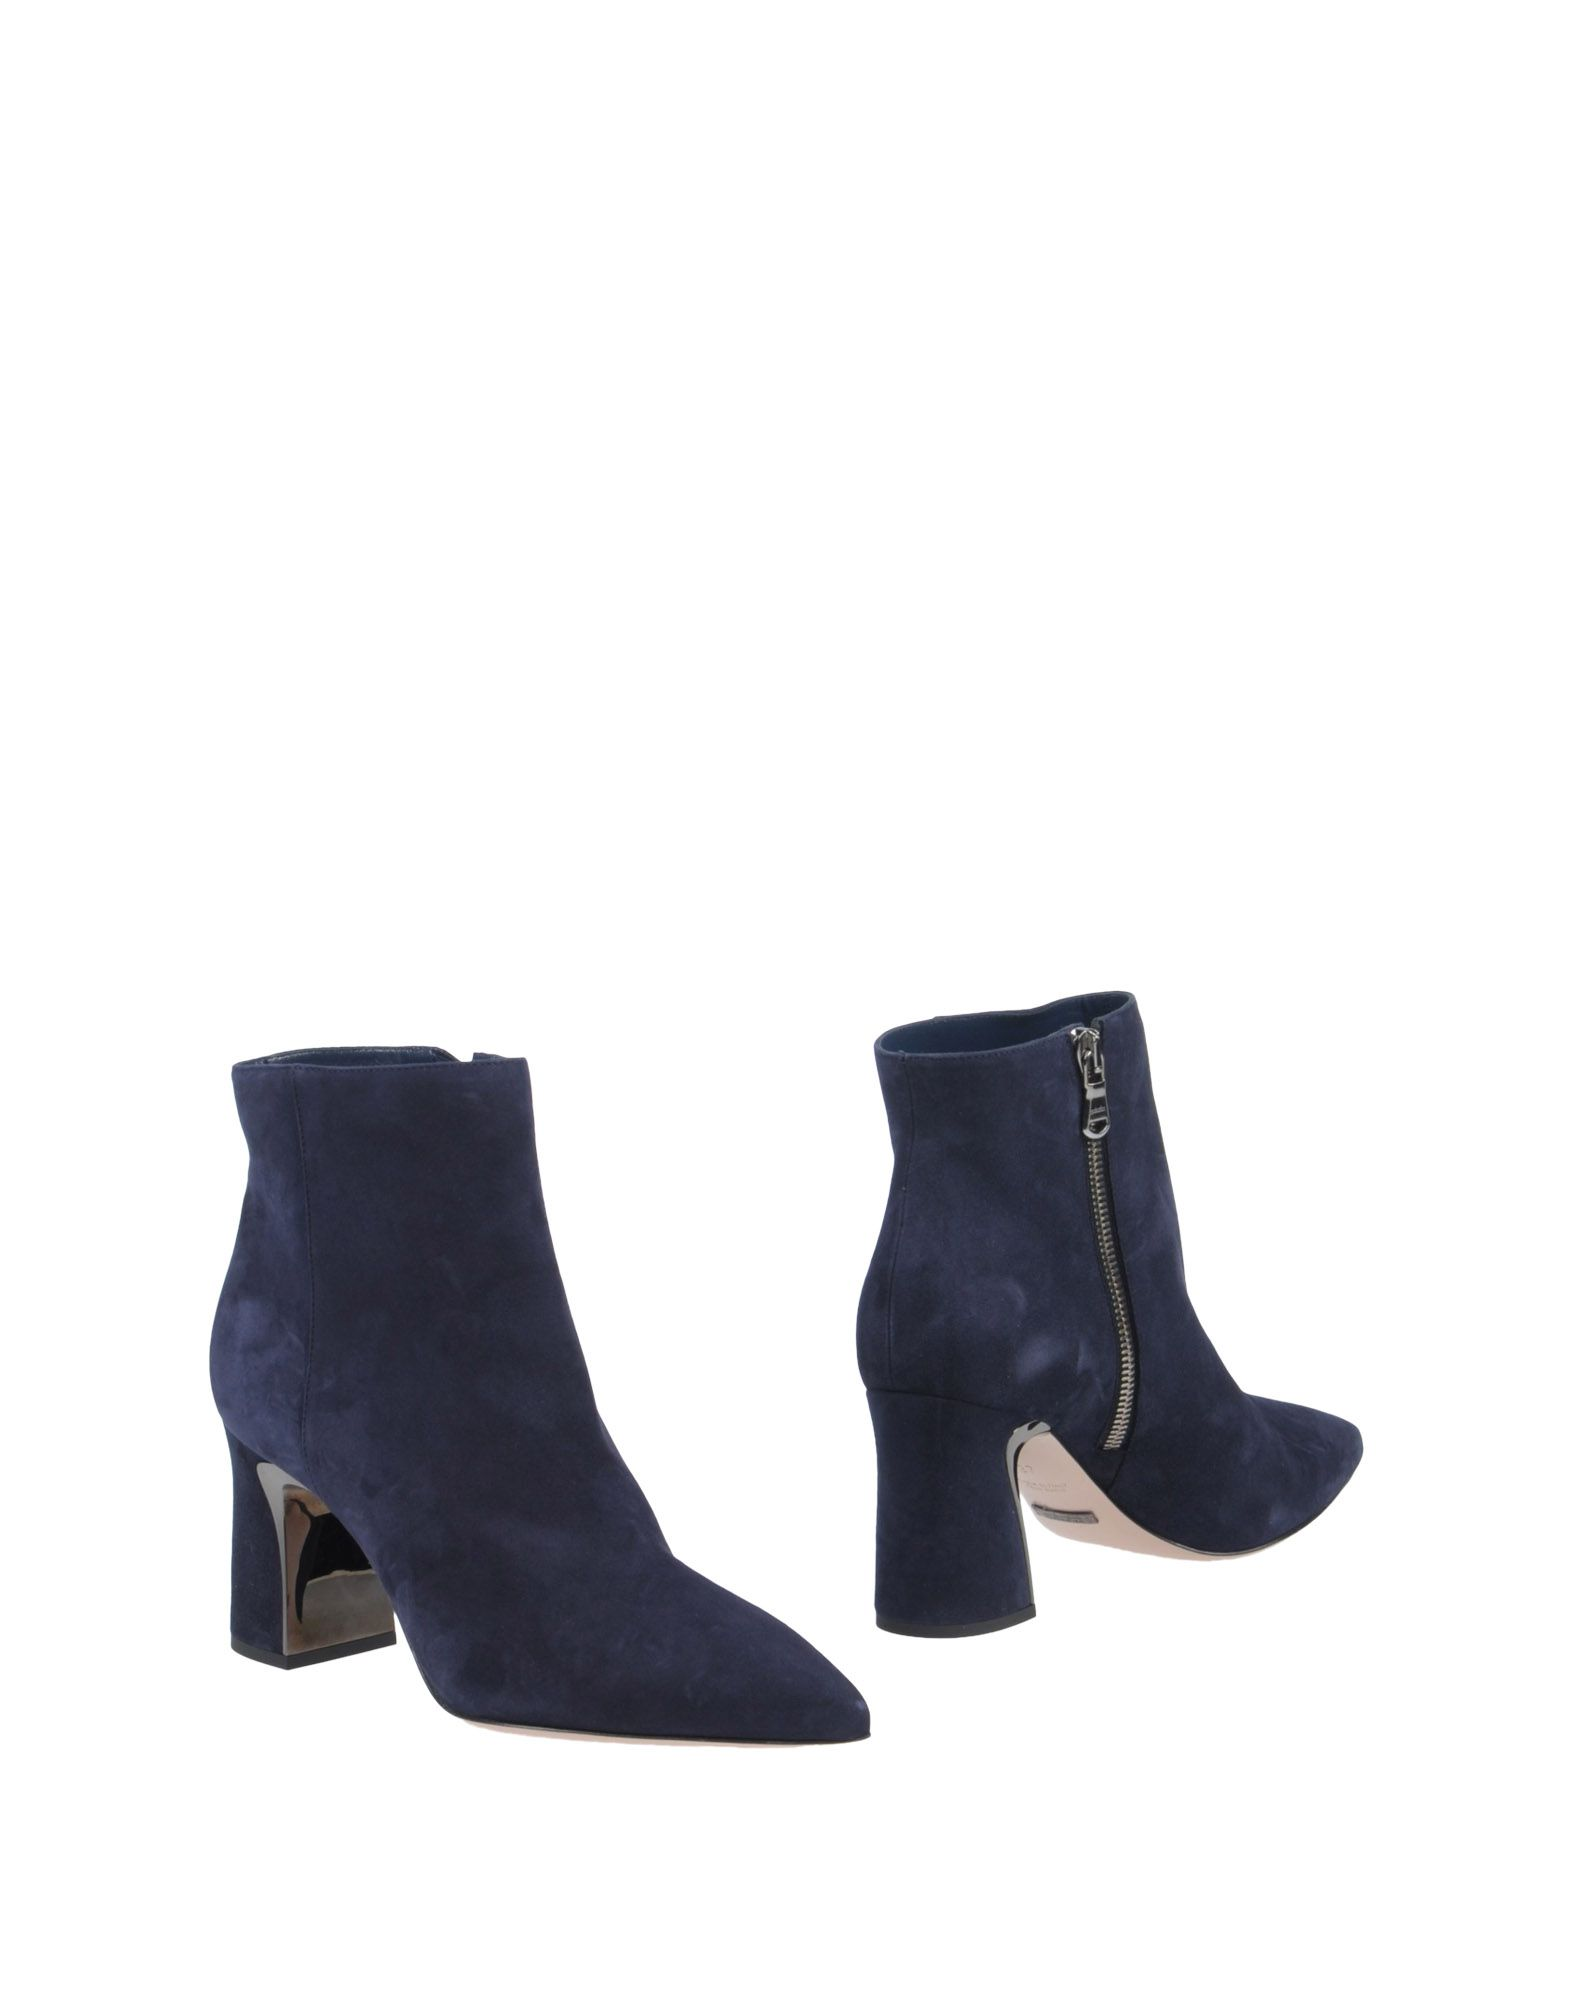 SEBASTIAN Полусапоги и высокие ботинки sebastian полусапоги и высокие ботинки